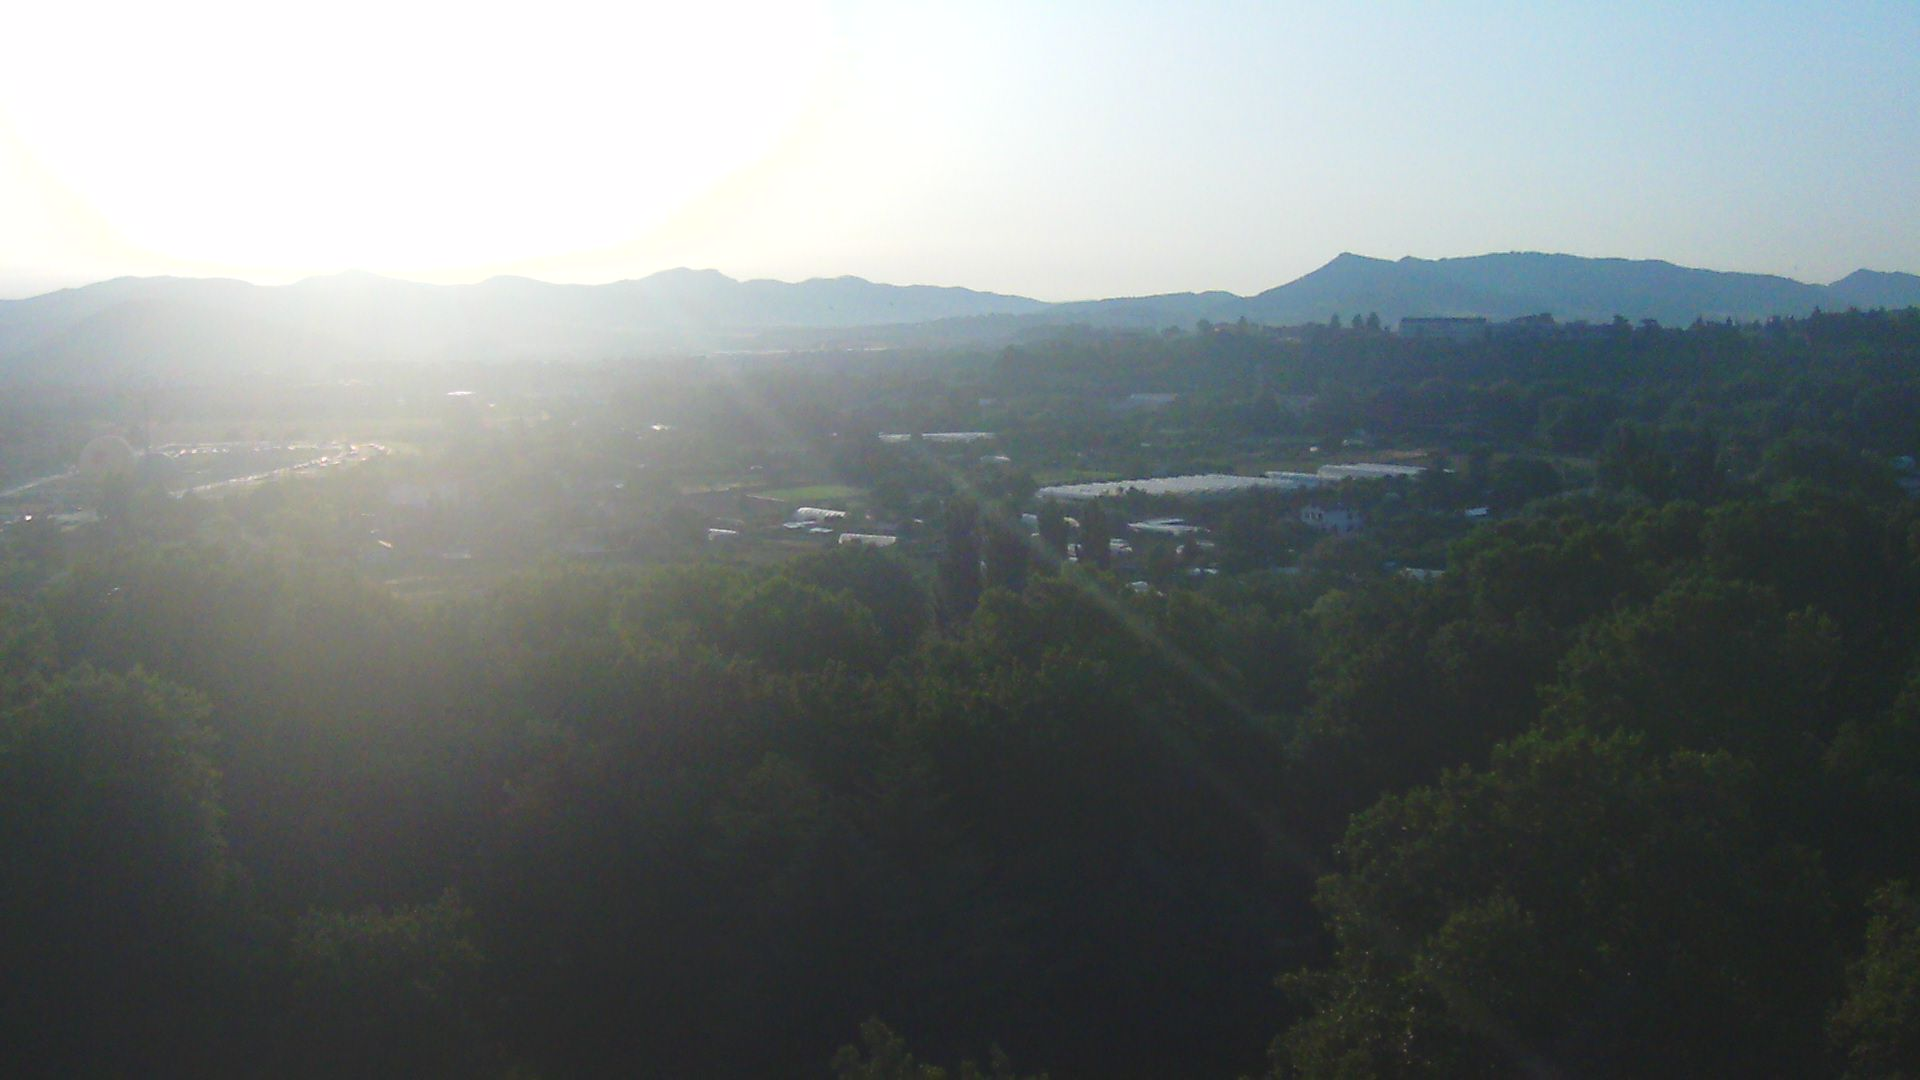 Pamplona So. 07:46